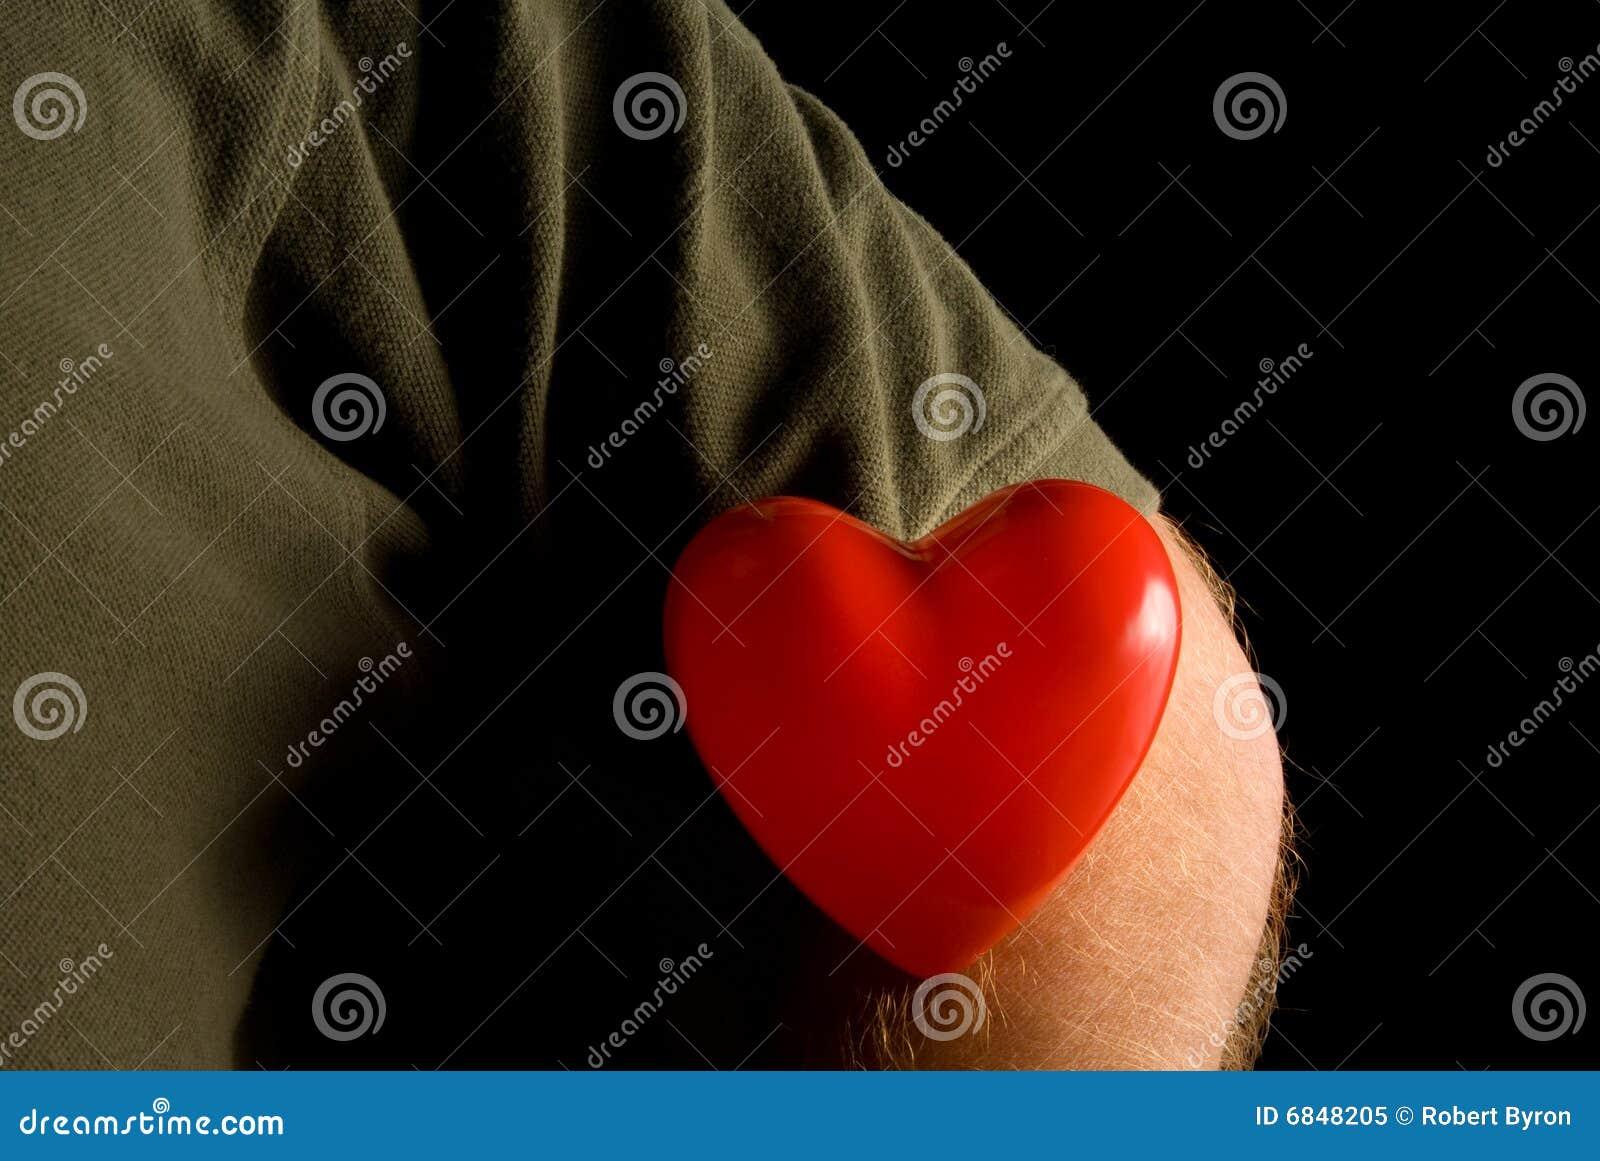 Сердце на втулке